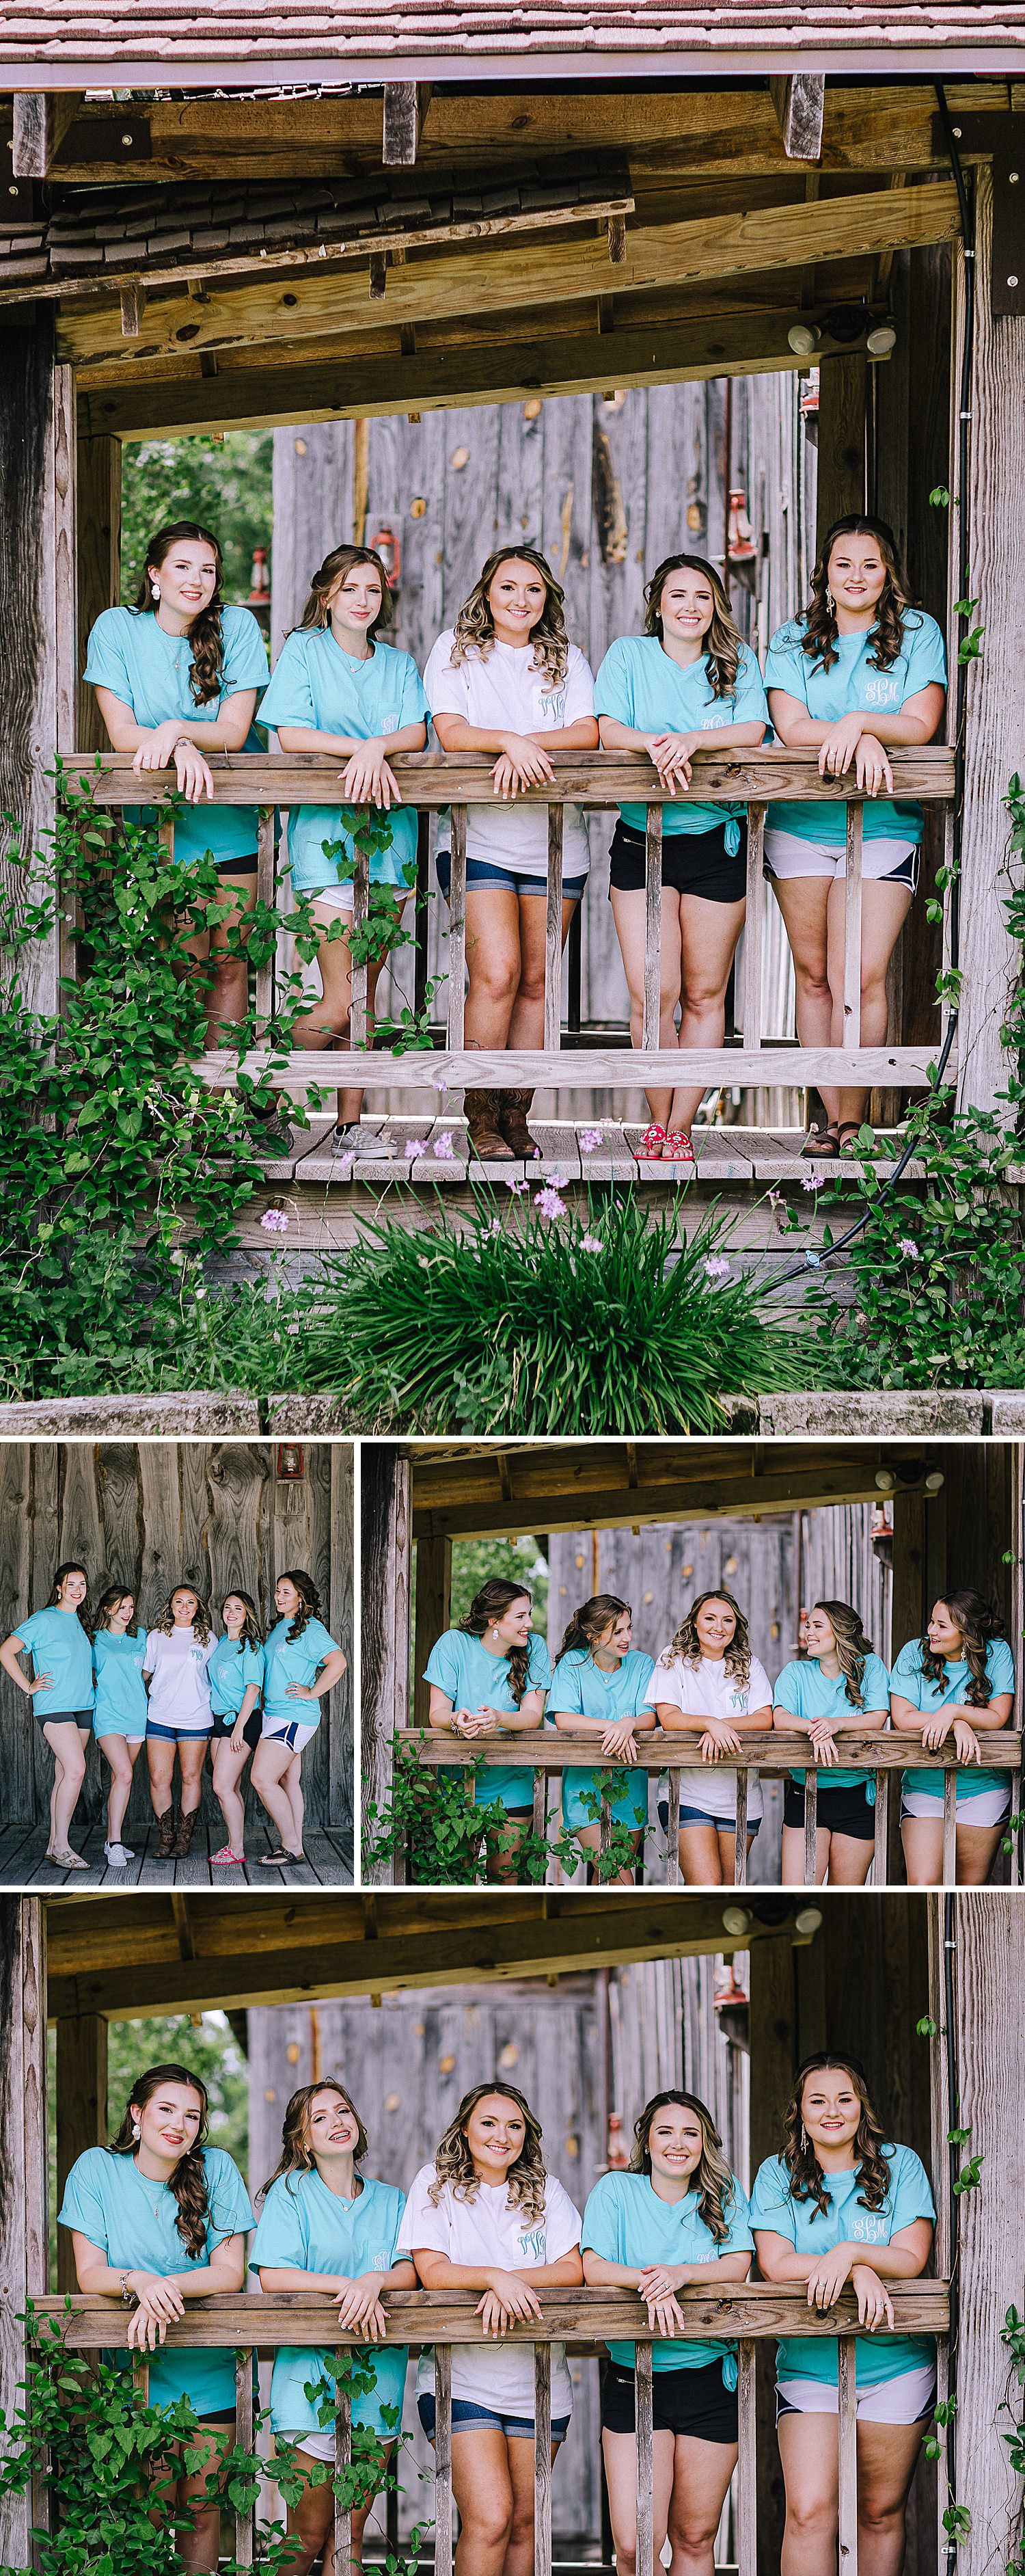 Carly-Barton-Photography-Old-Town-Texas-Rustic-Wedding-Photos-Sunflowers-Boots-Kyle-Texas_0024.jpg